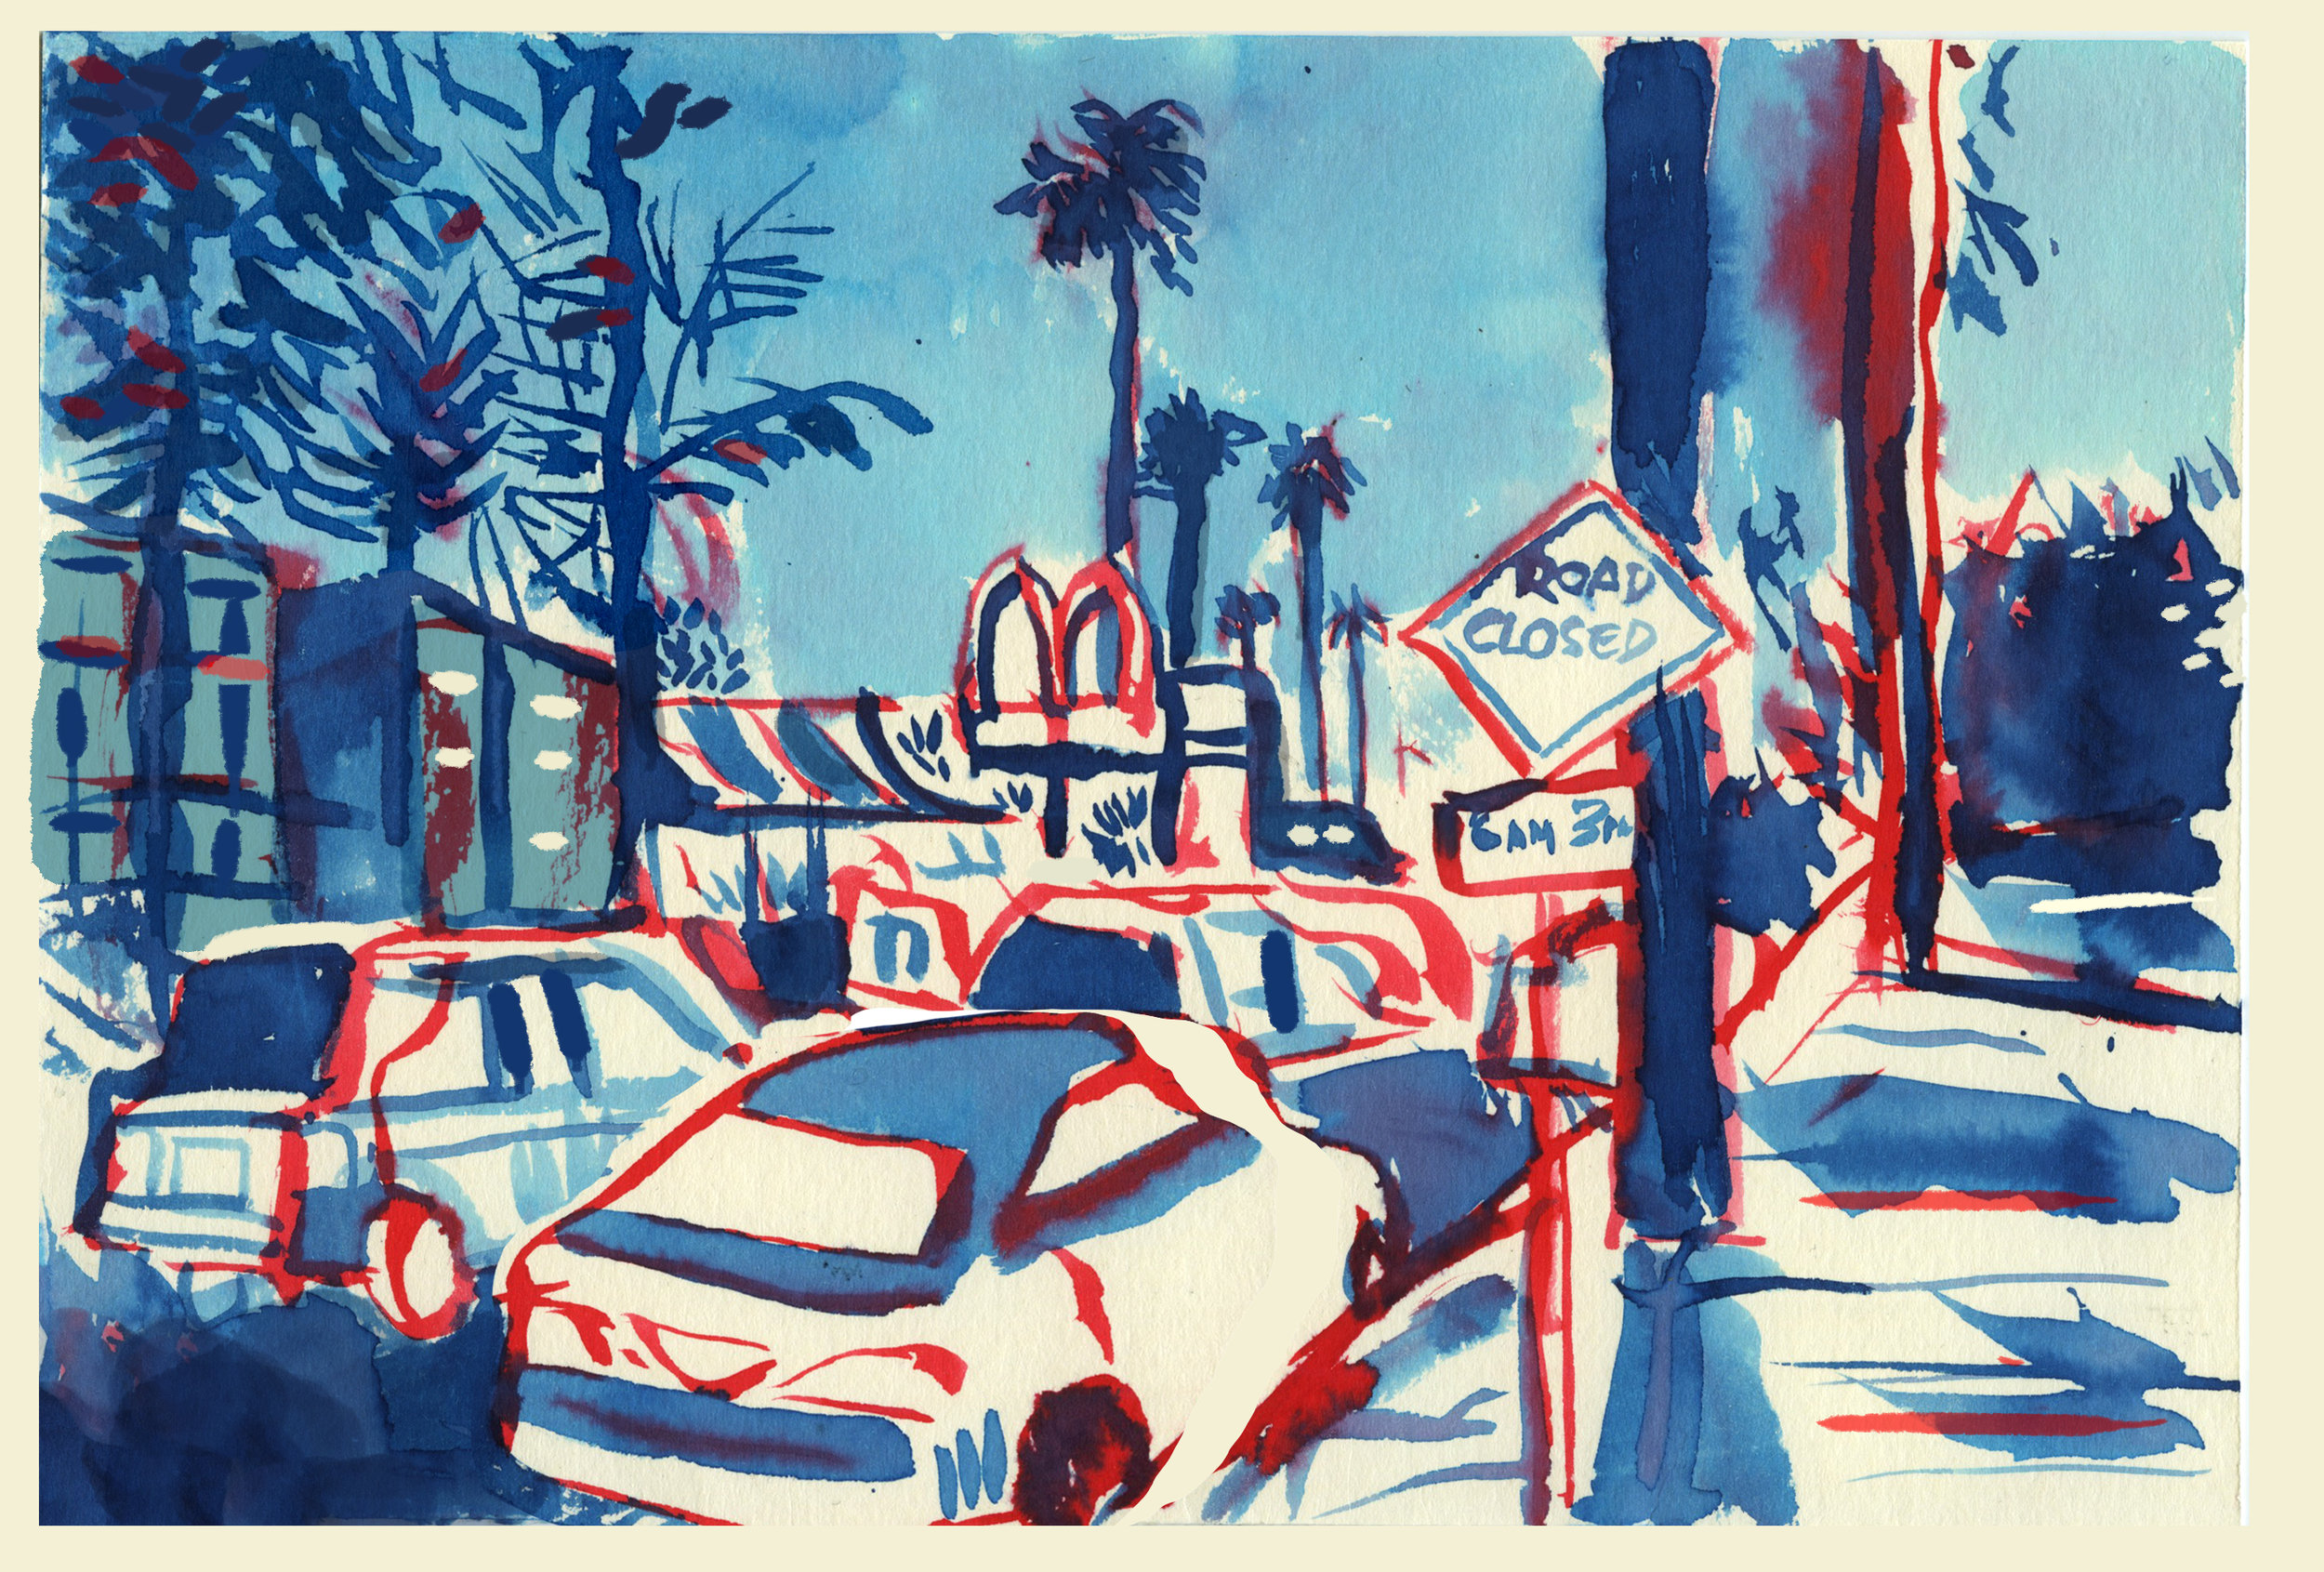 'L.A Night Scene'   Ink sketch of an L.A street.